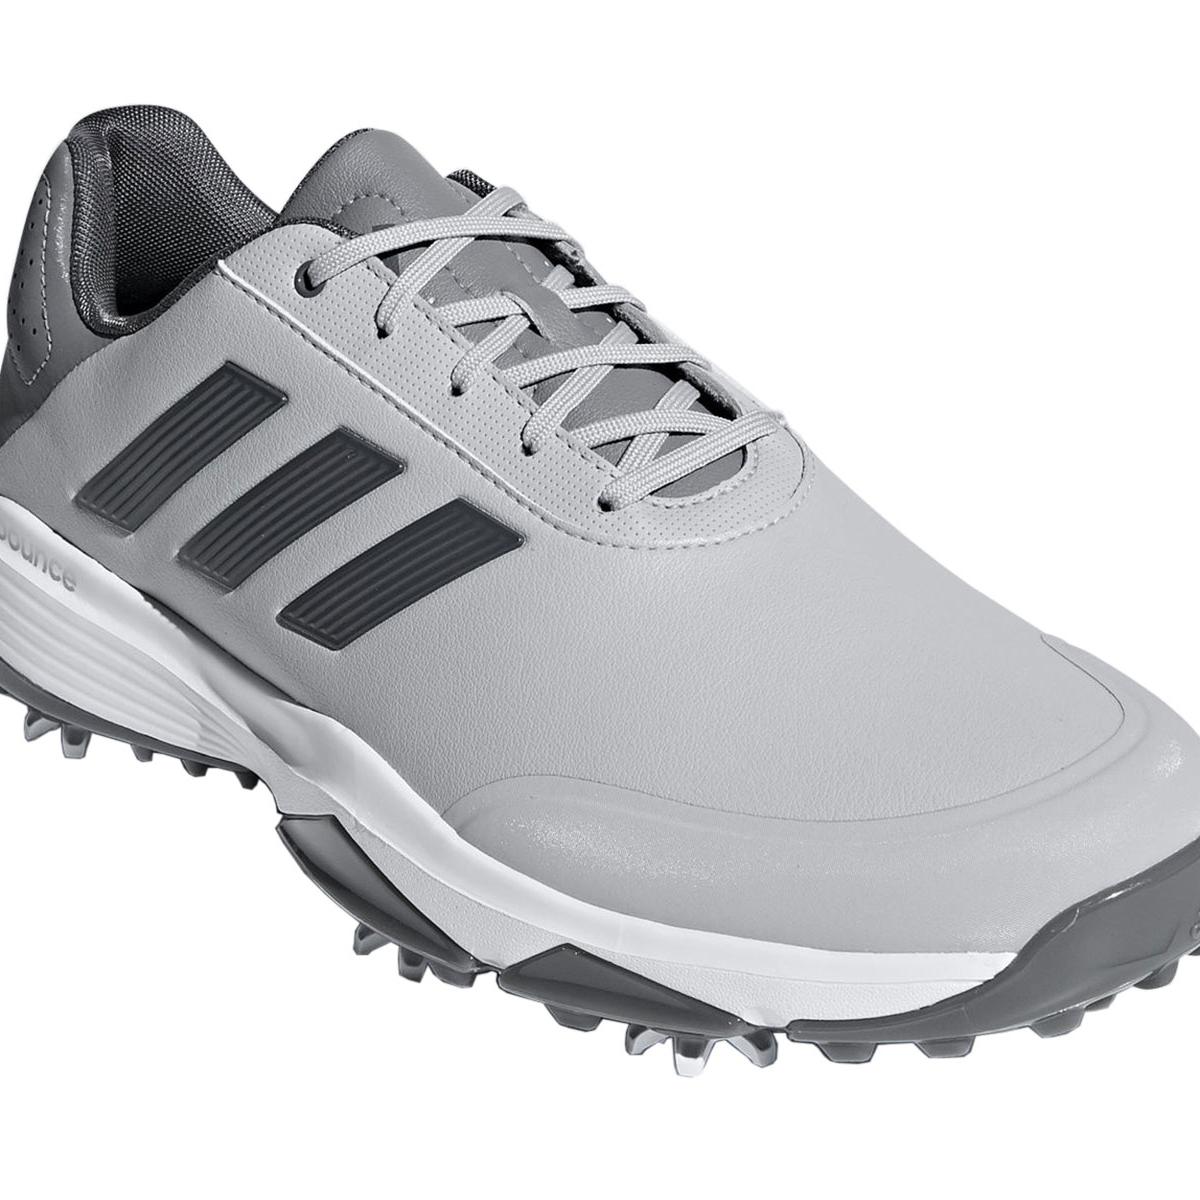 50b6c0d463f8c adidas Golf Adipower Bounce Shoes